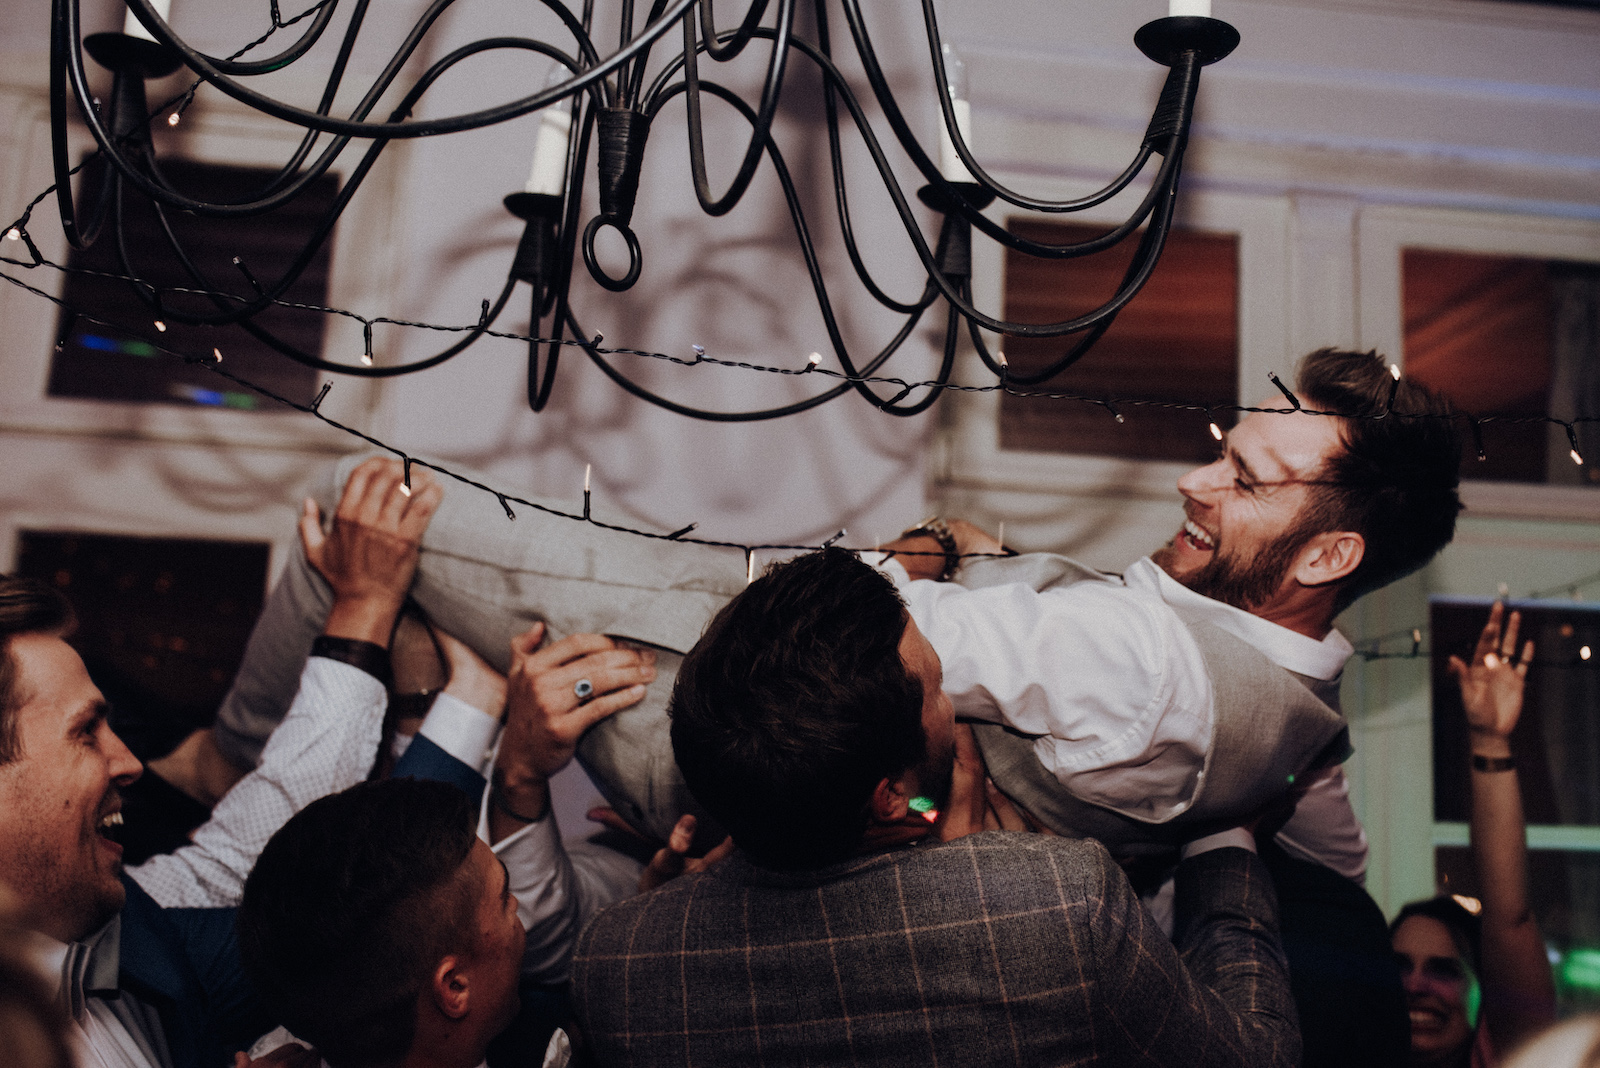 Hochzeitsfeier, Gut-Bliestorf